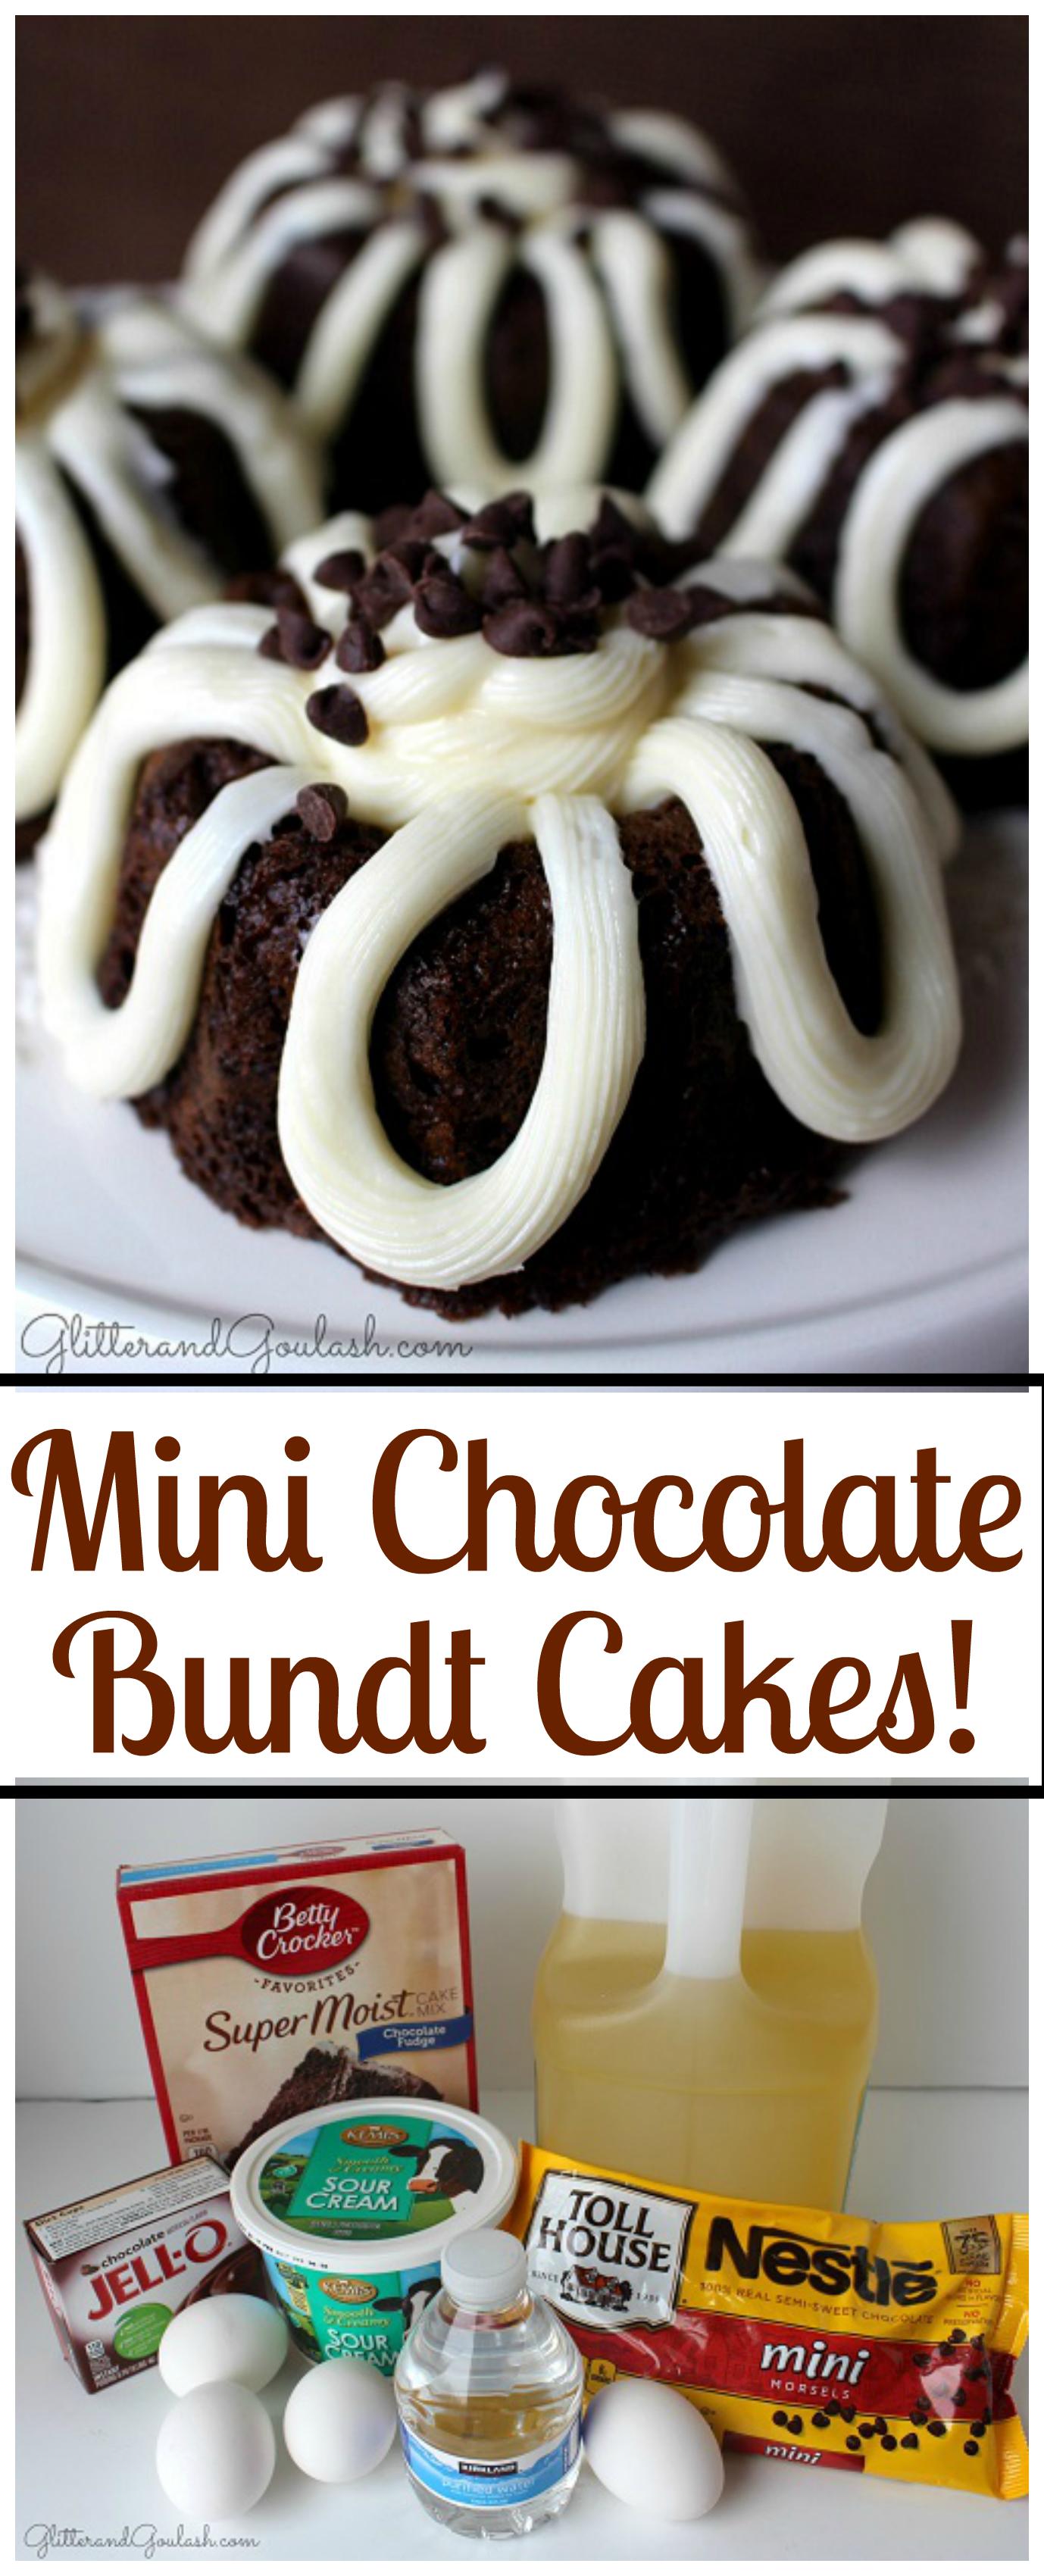 Mini Chocolate Bundt Cake Recipe With Images Mini Bundt Cakes Recipes Chocolate Bundt Cake Savoury Cake